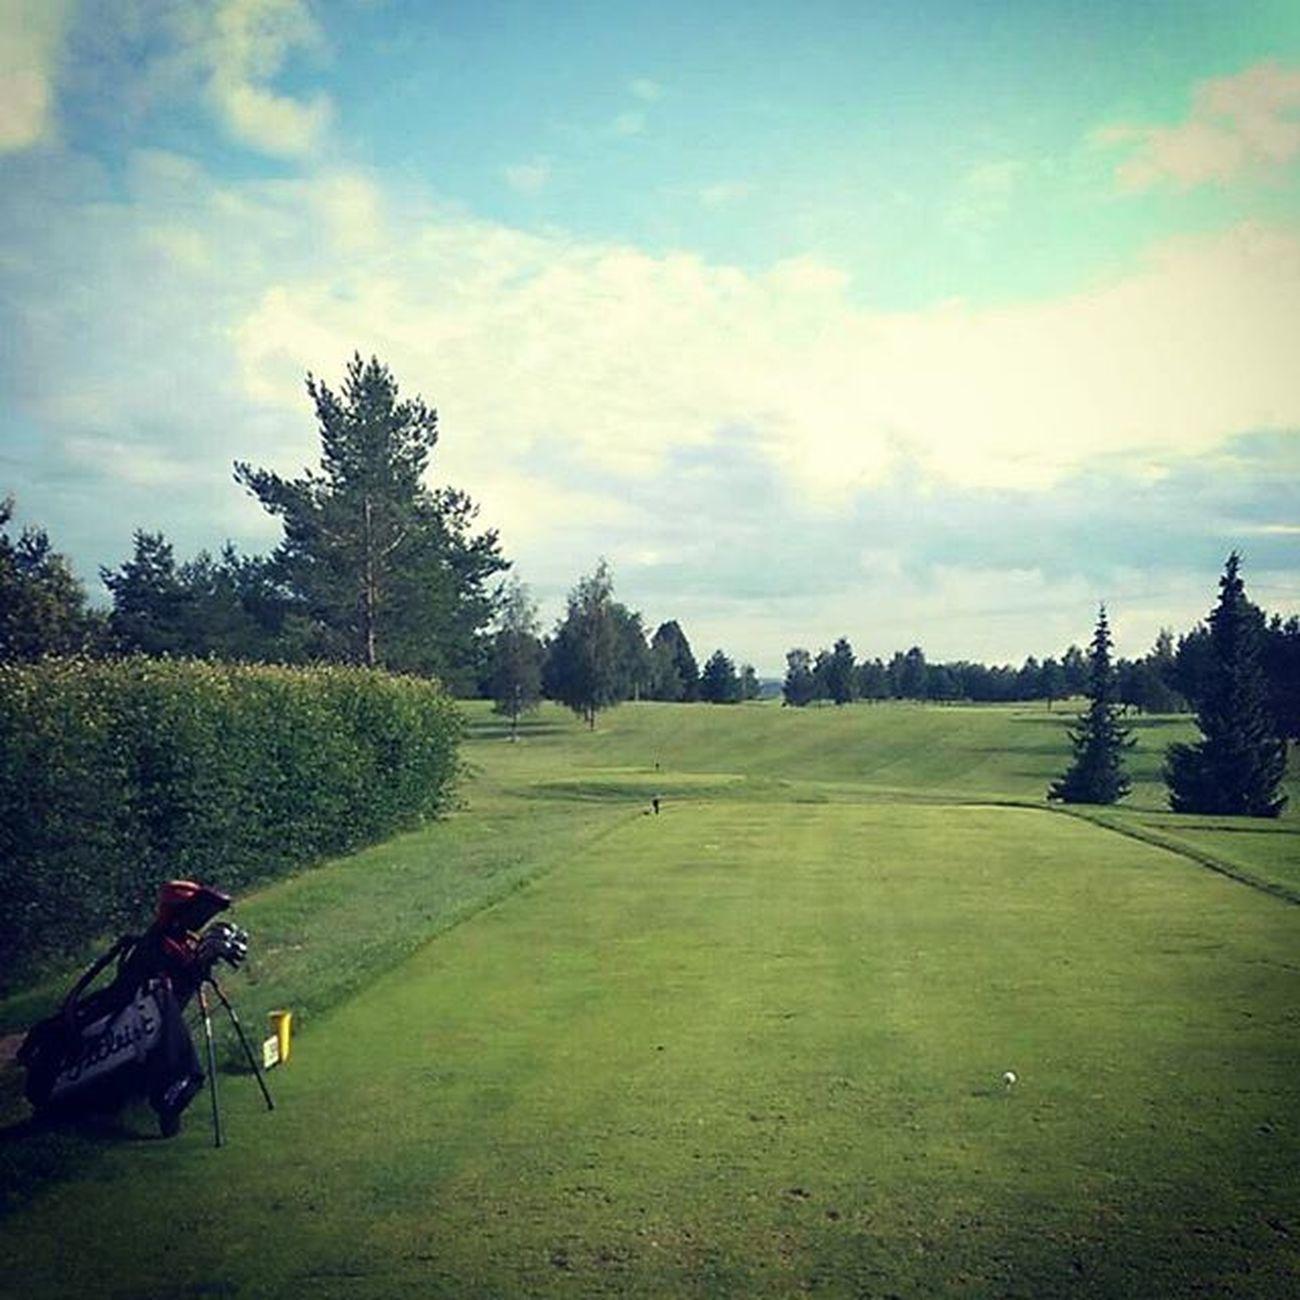 The best feeling is when you start your day at the tee Golf Golfing Golfbag Teetime Golfcourse Tee Titleistgolf Titleist Nike Nikegolf Bestfeeling Bestfeelingever GoodTimes Ap2 Ap2irons Covert